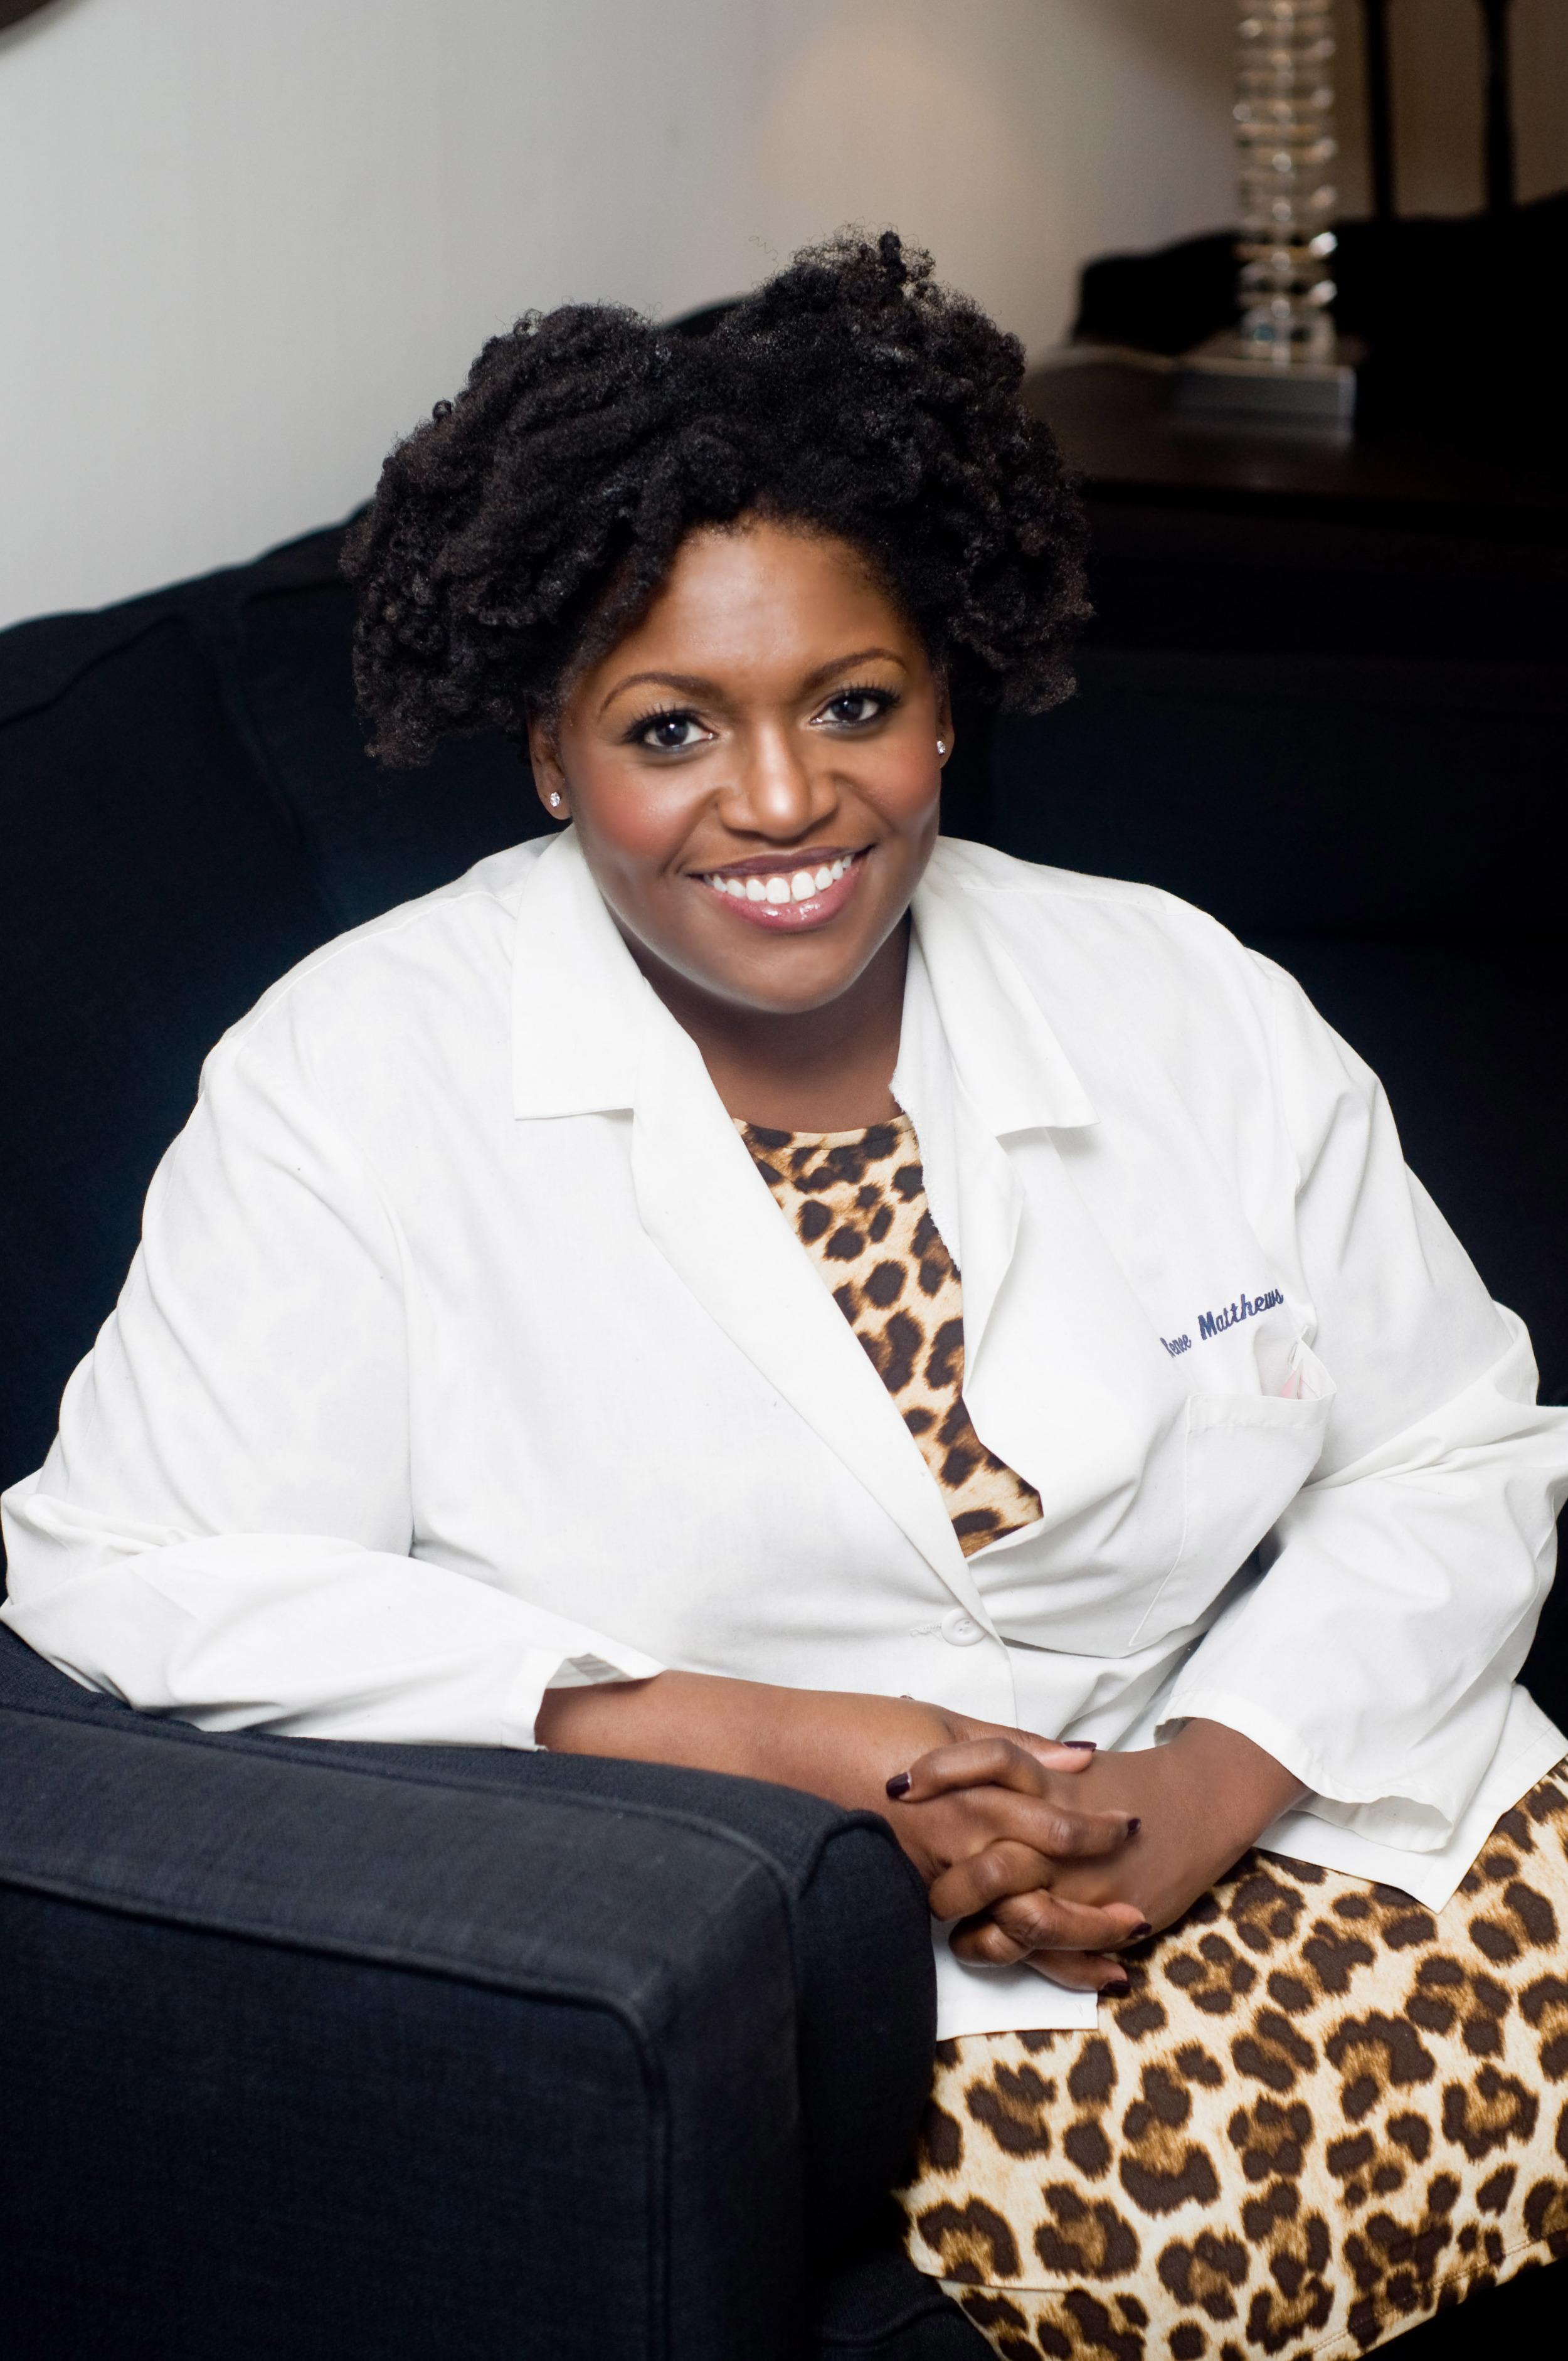 Dr. Renee Matthews